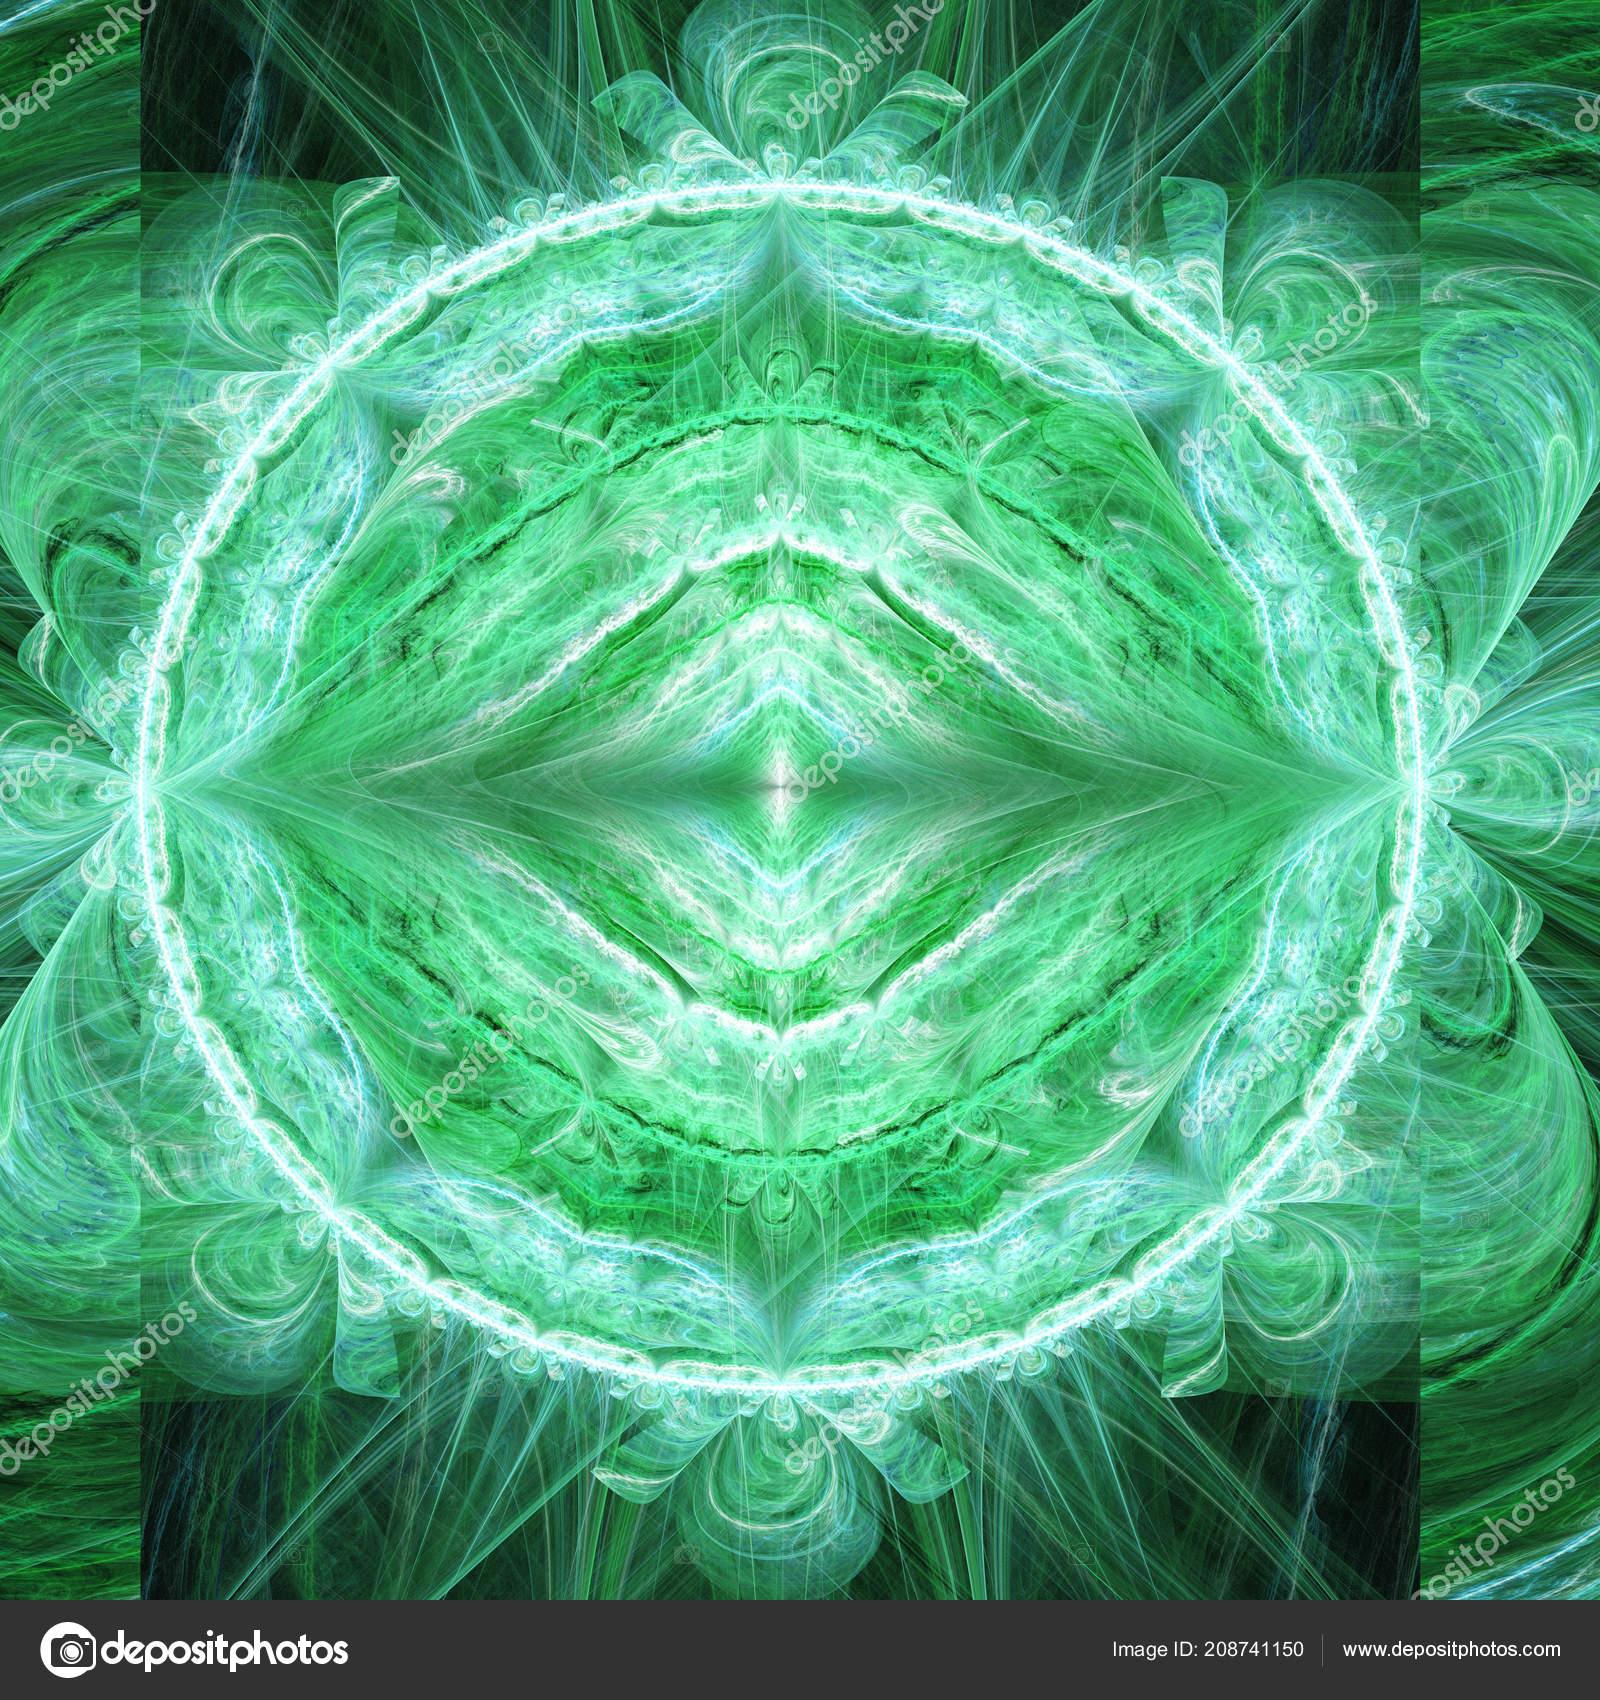 Hd Sacred Geometry Wallpaper